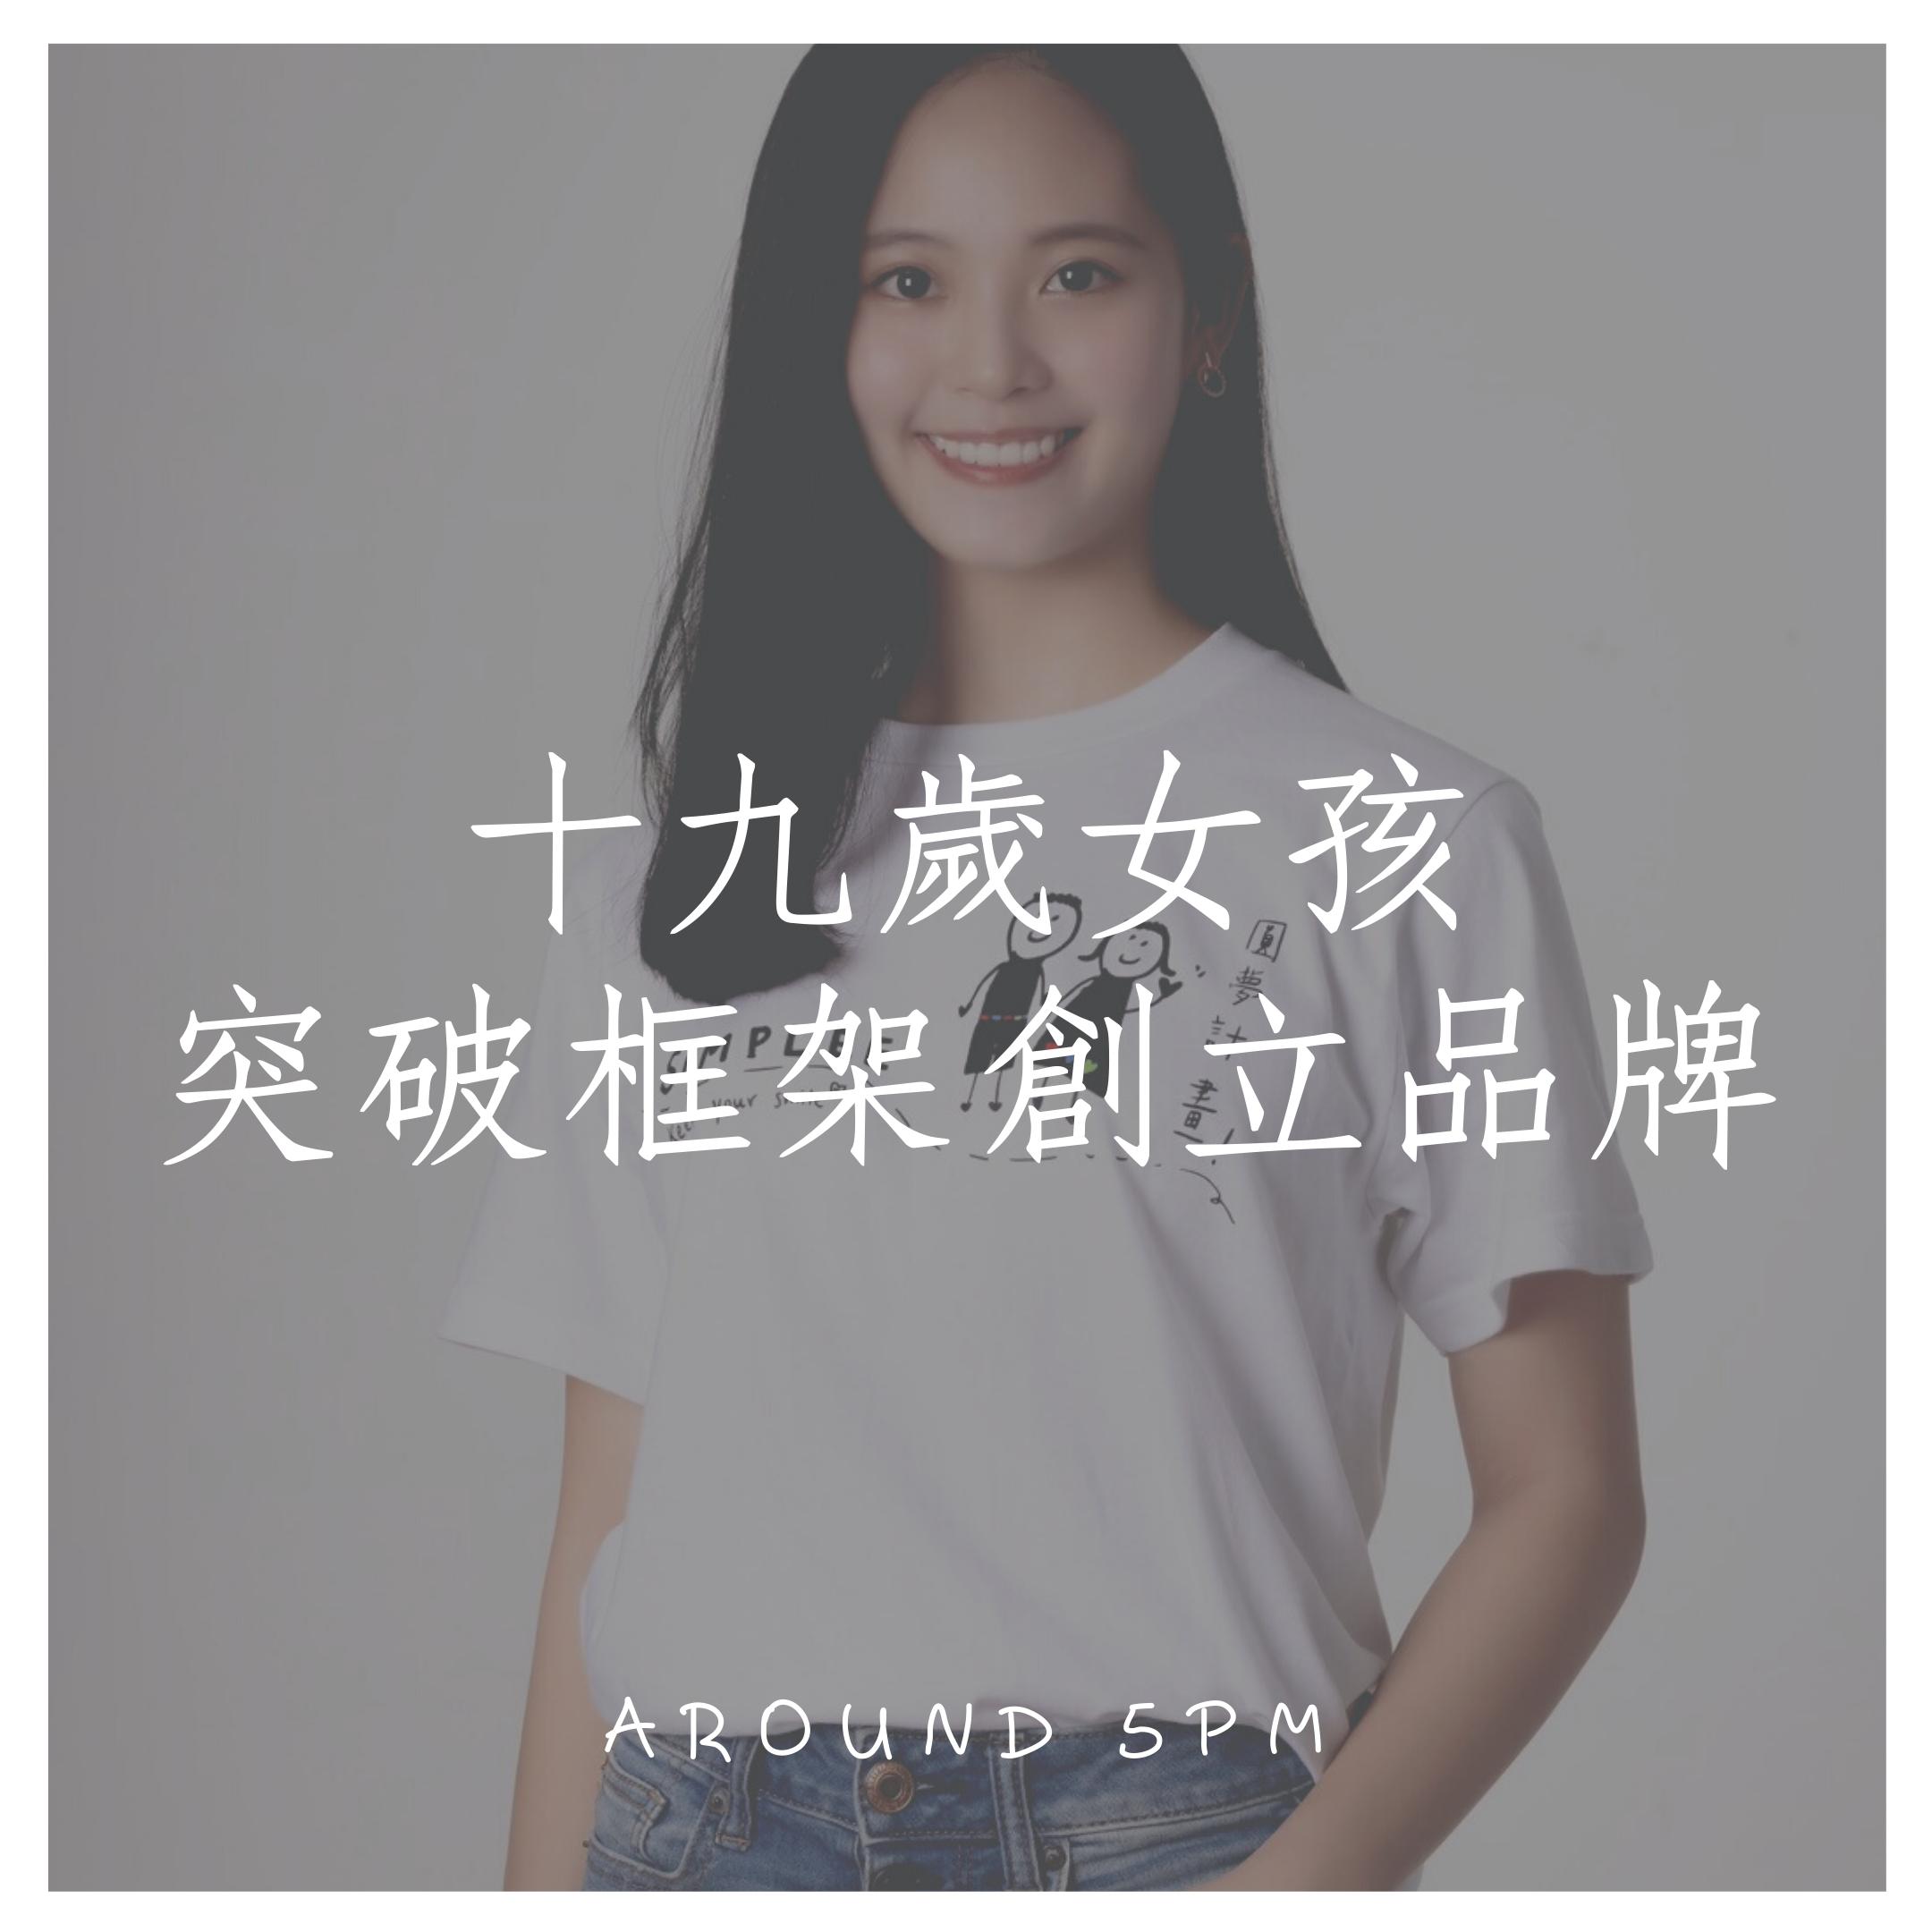 EP.59 19歲突破框架,創立自己的品牌 │享樂主義創辦人 夏琳 Charlene